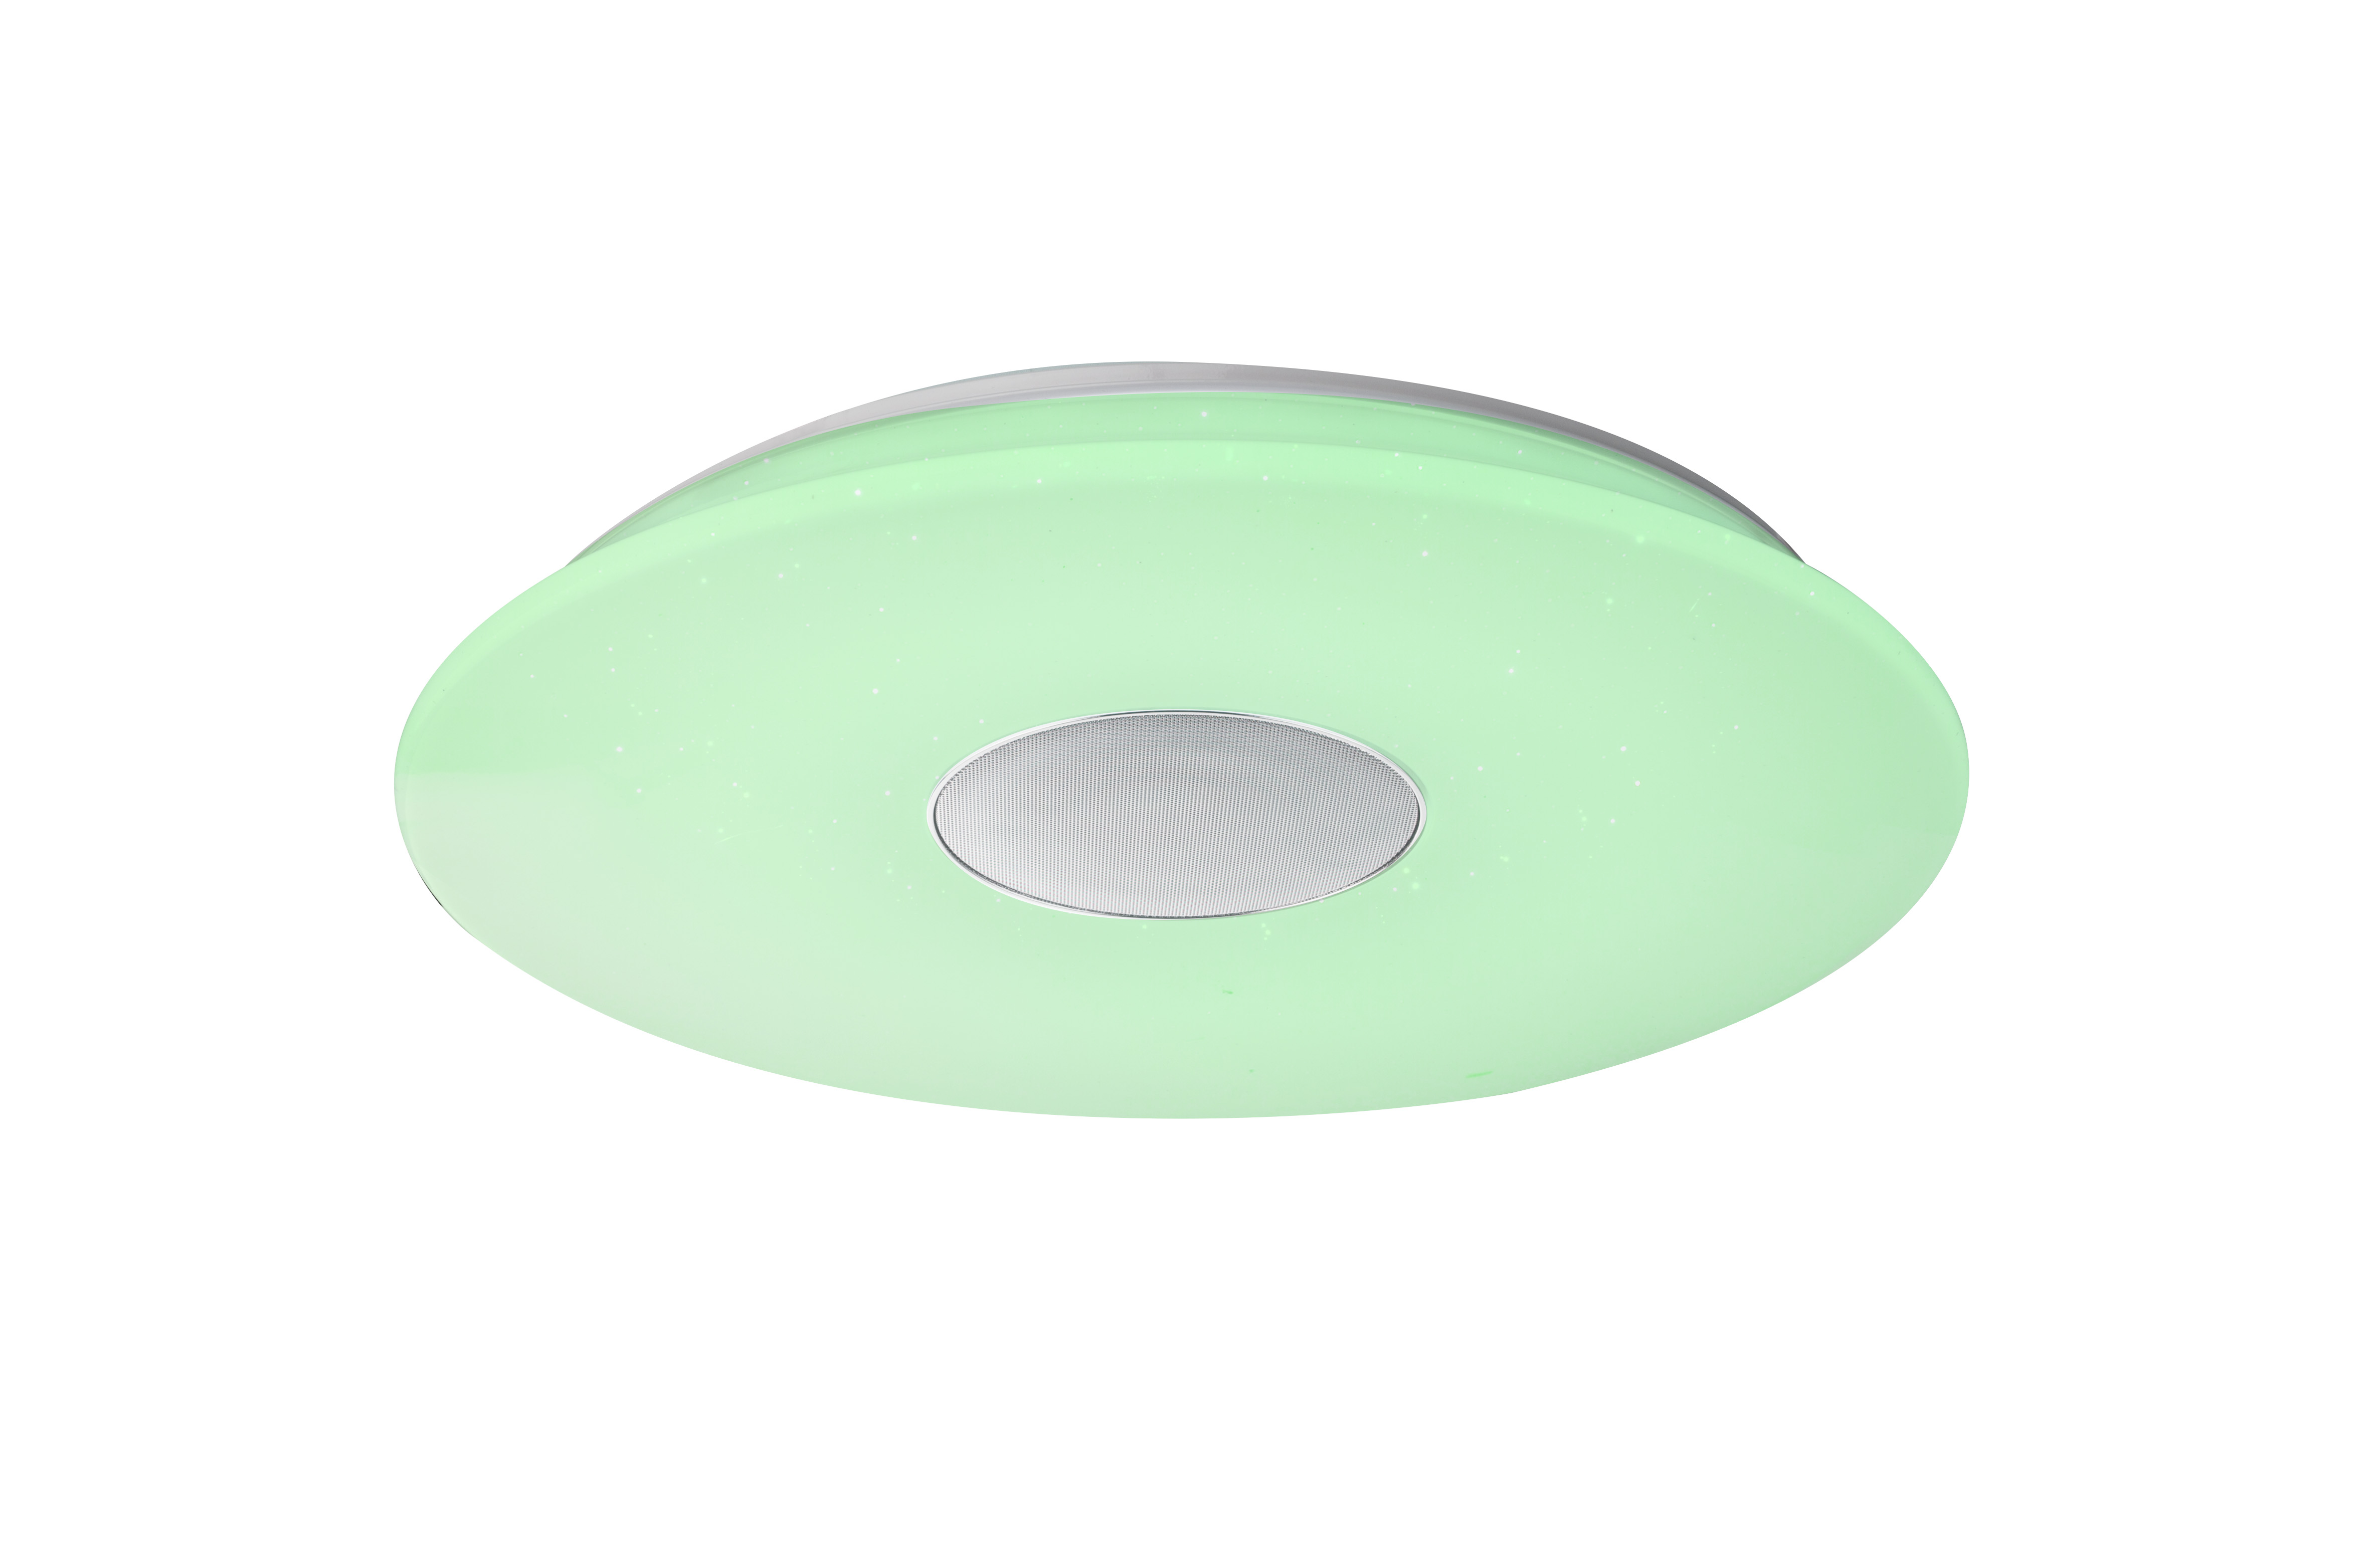 Plafoniera Led Rgb : Plafoniera dimabila cu led rgb difuzor si conectare bluetooth